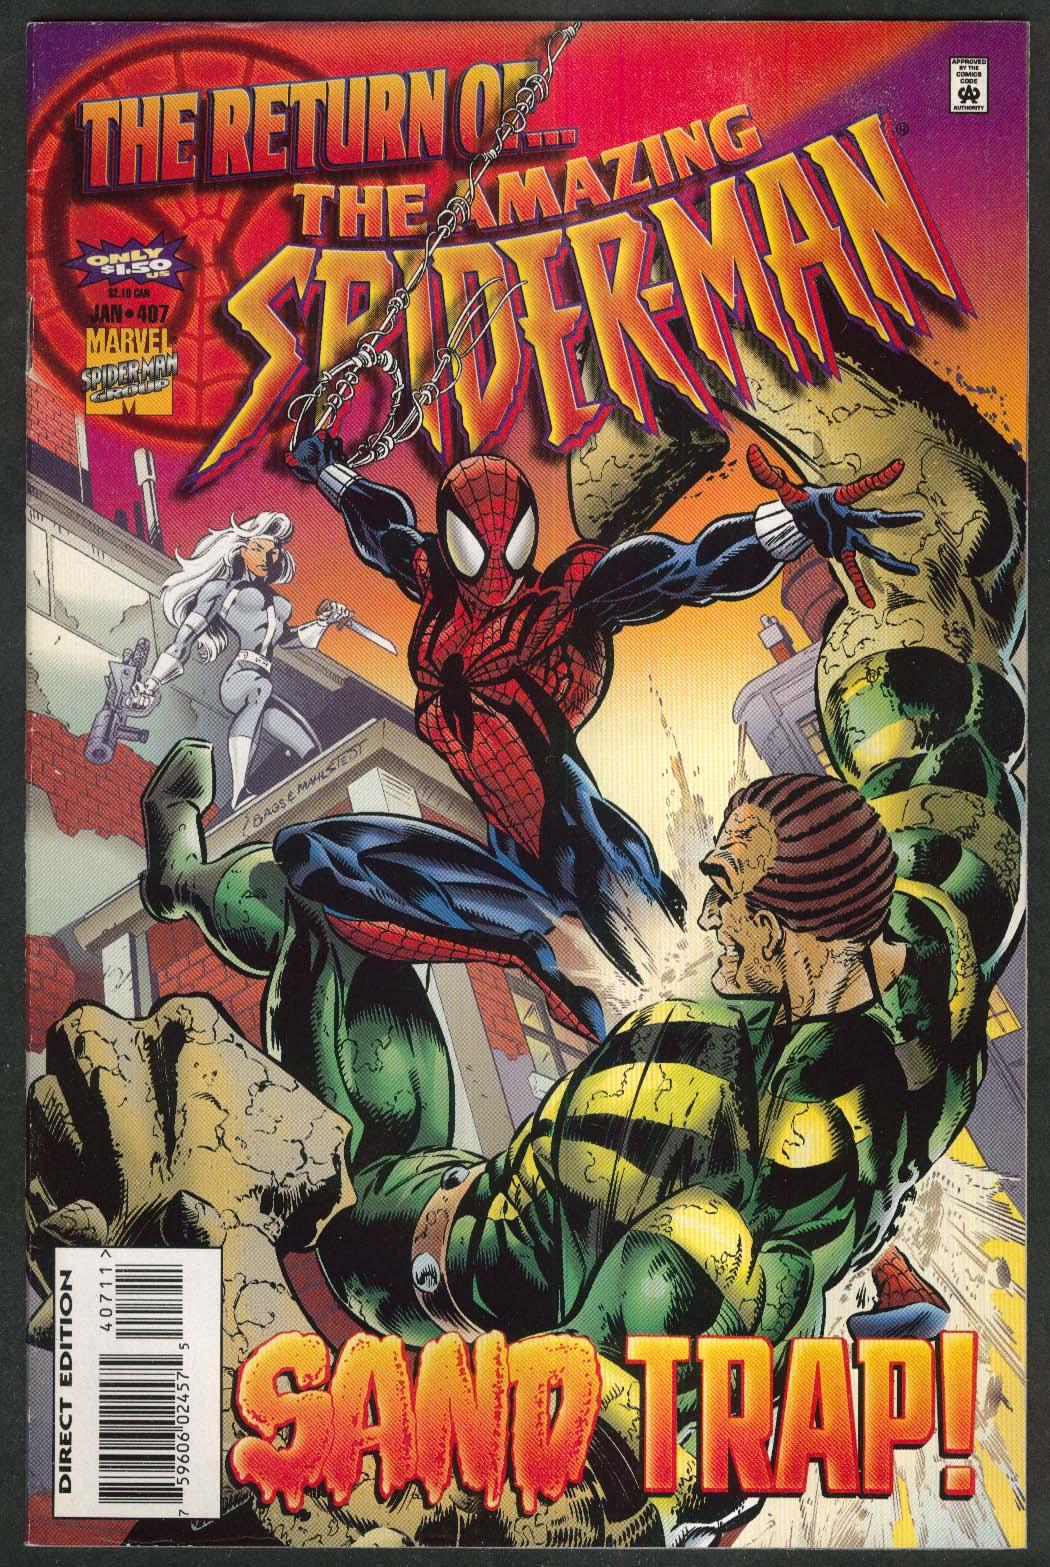 AMAZING SPIDER-MAN #407 Marvel comic book 1 1996